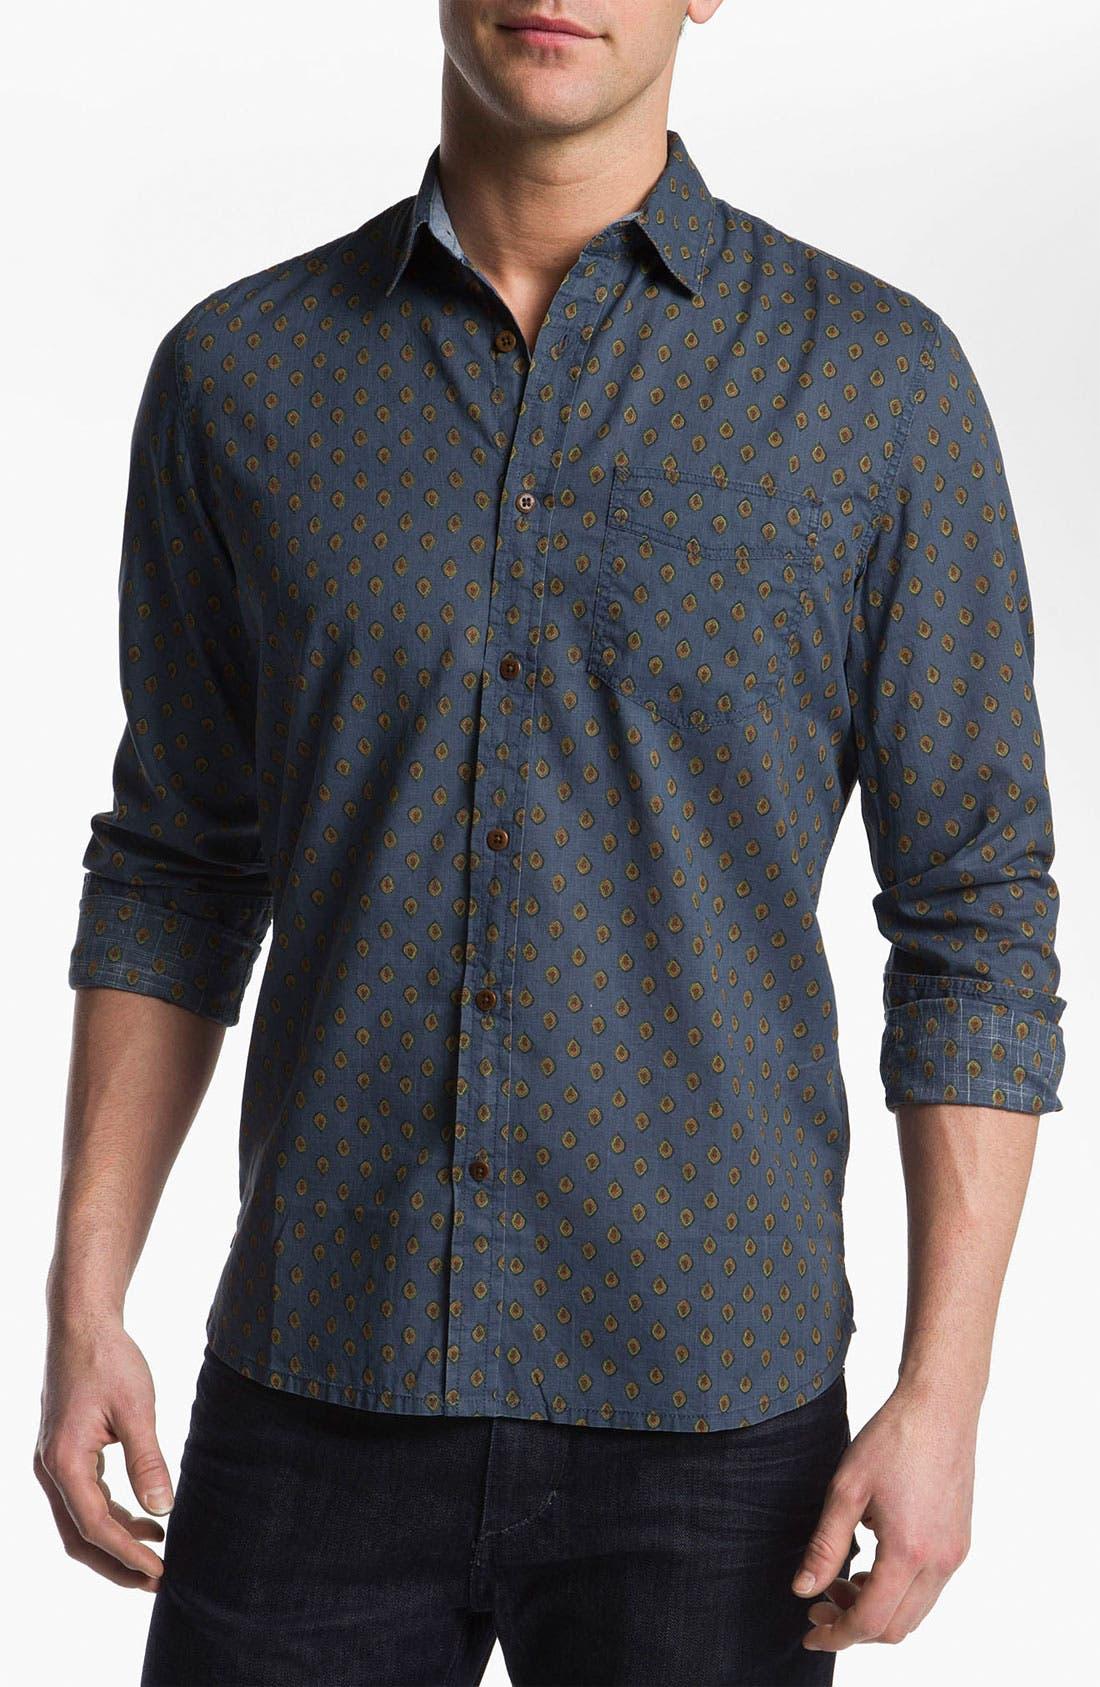 Alternate Image 1 Selected - Woolrich John Rich 'William' Woven Shirt